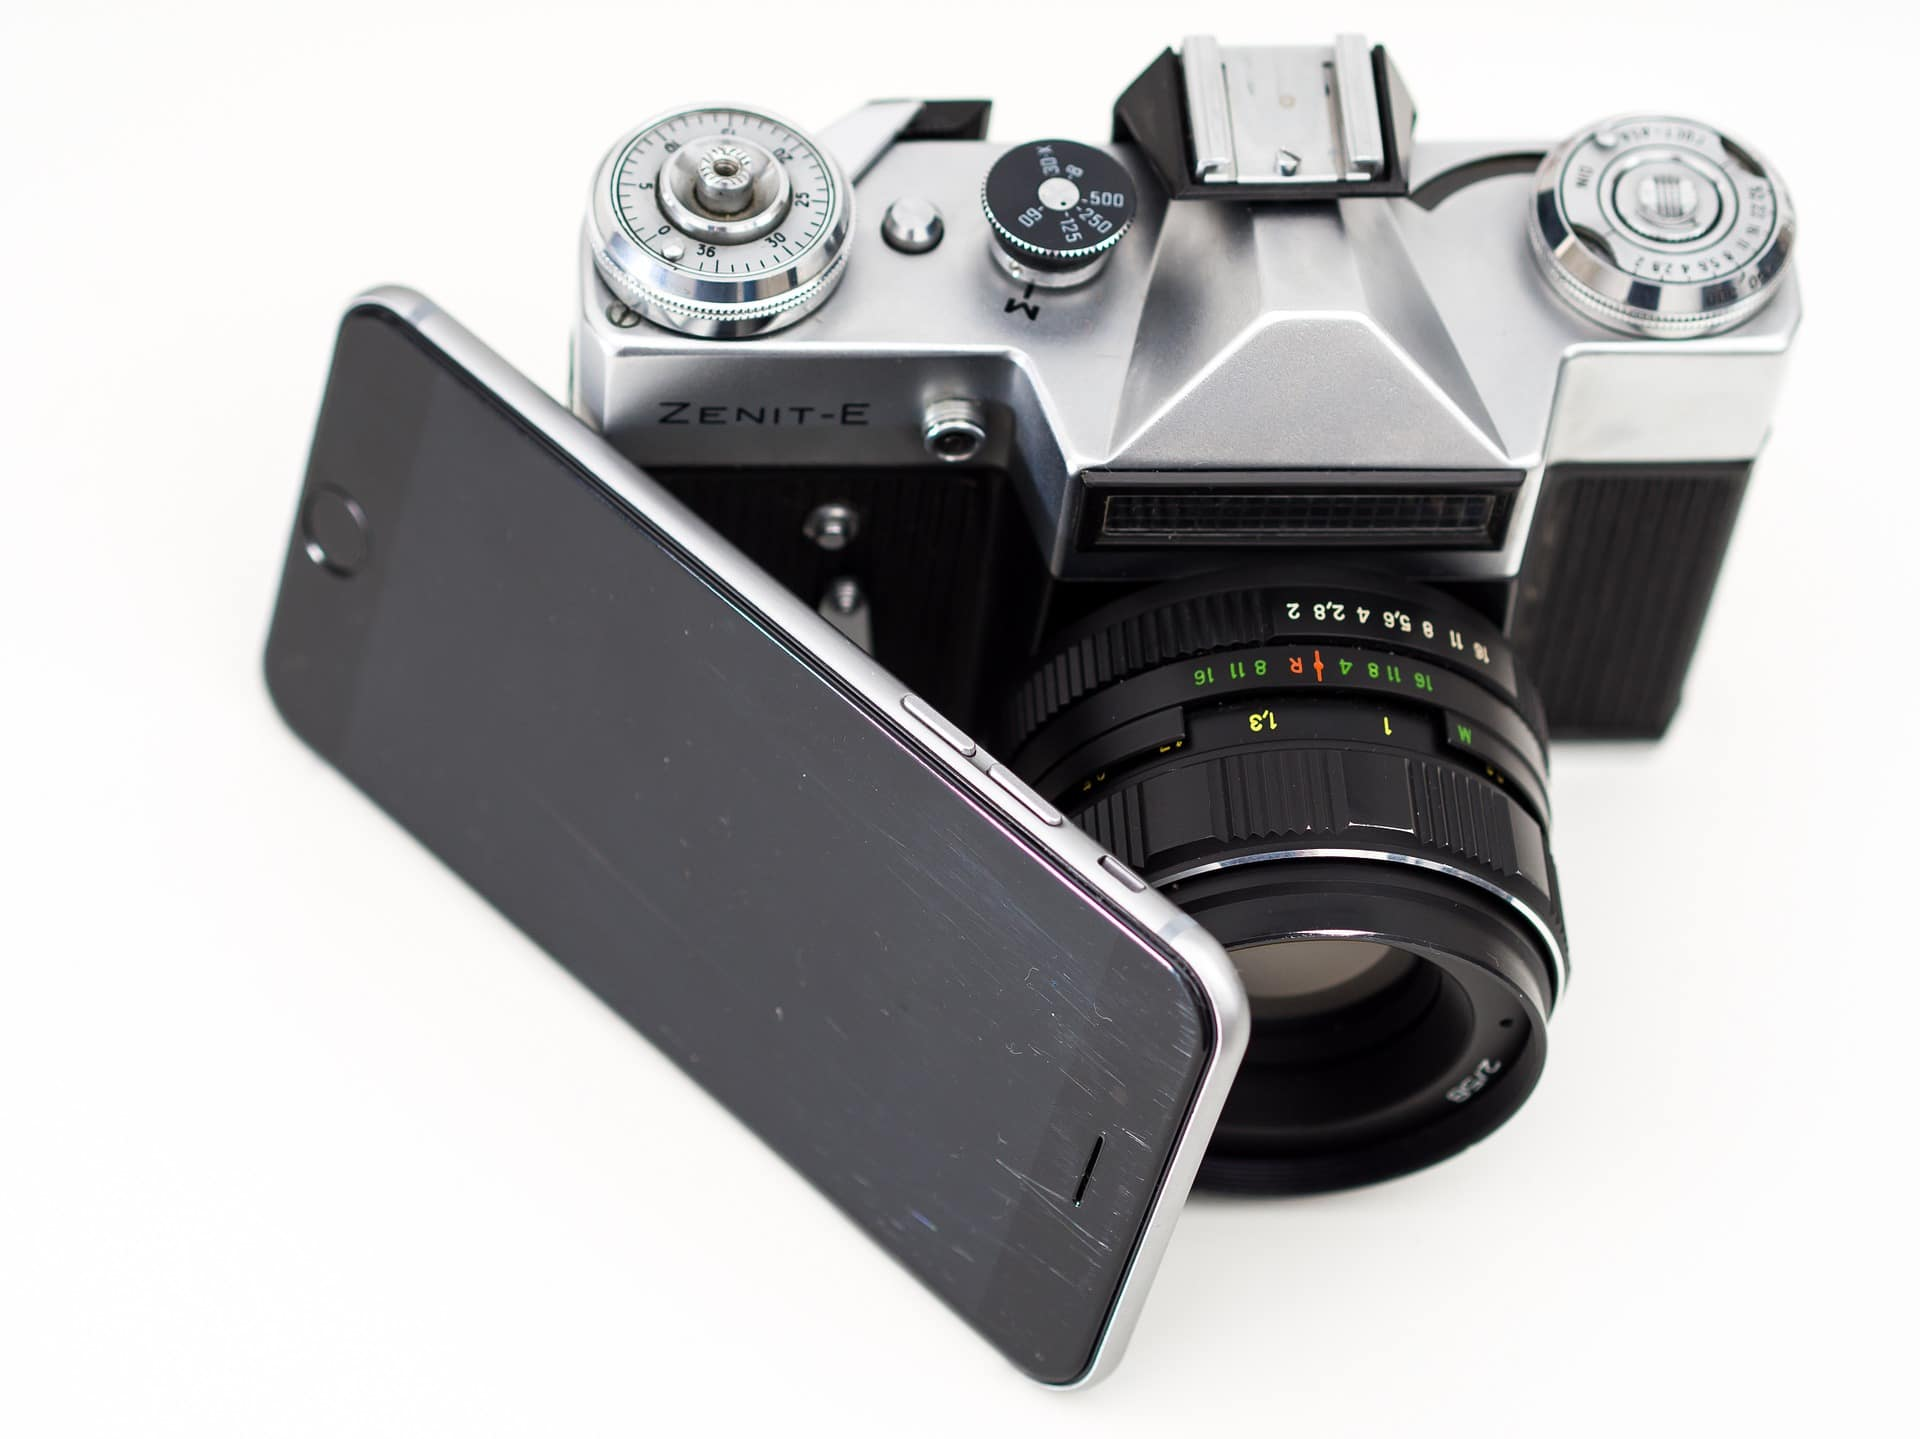 Appareil photo et smartphone